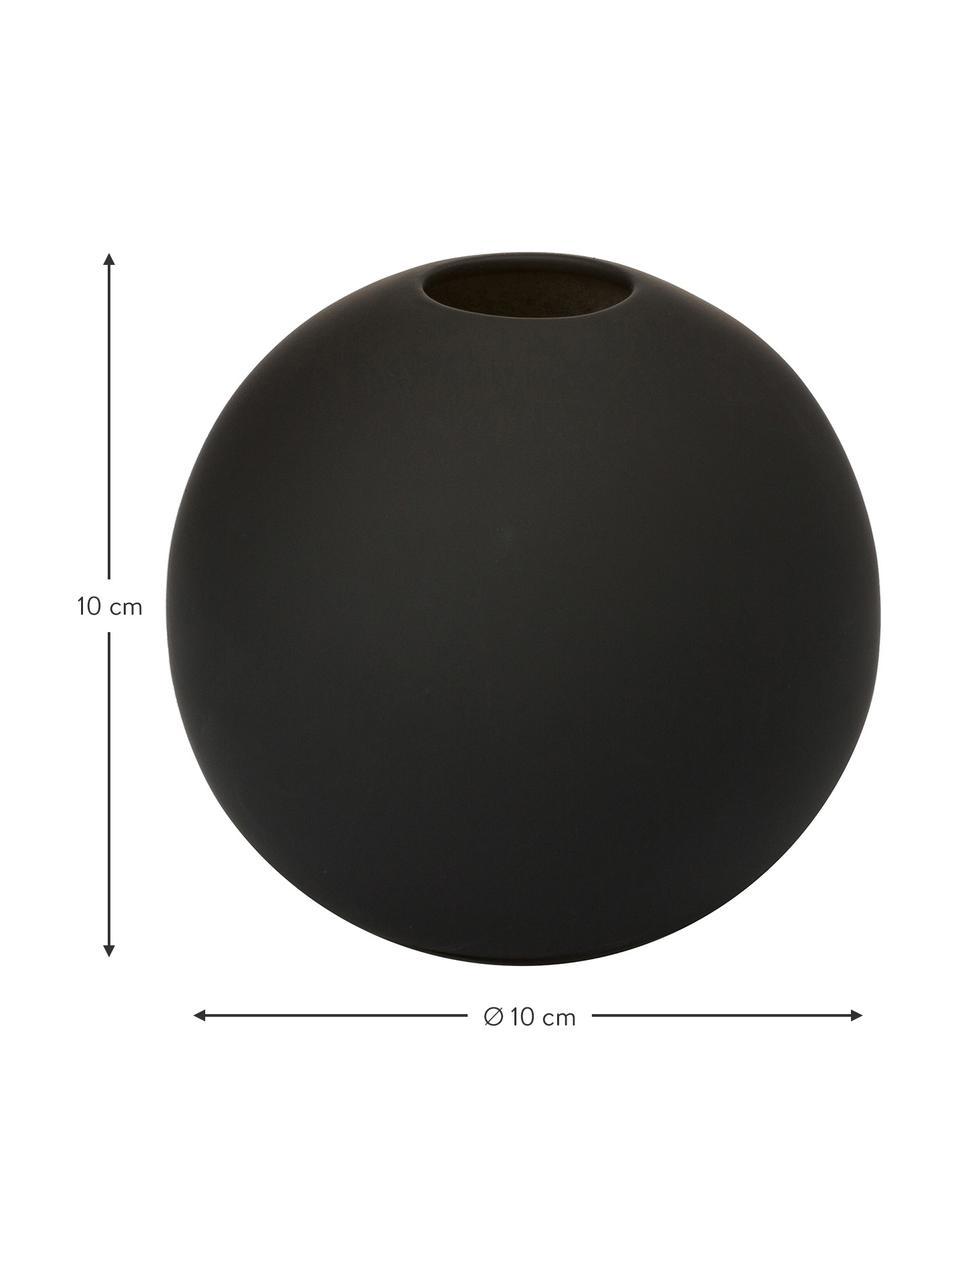 Handgefertigte Kugel-Vase Ball, Keramik, Schwarz, Ø 10 x H 10 cm